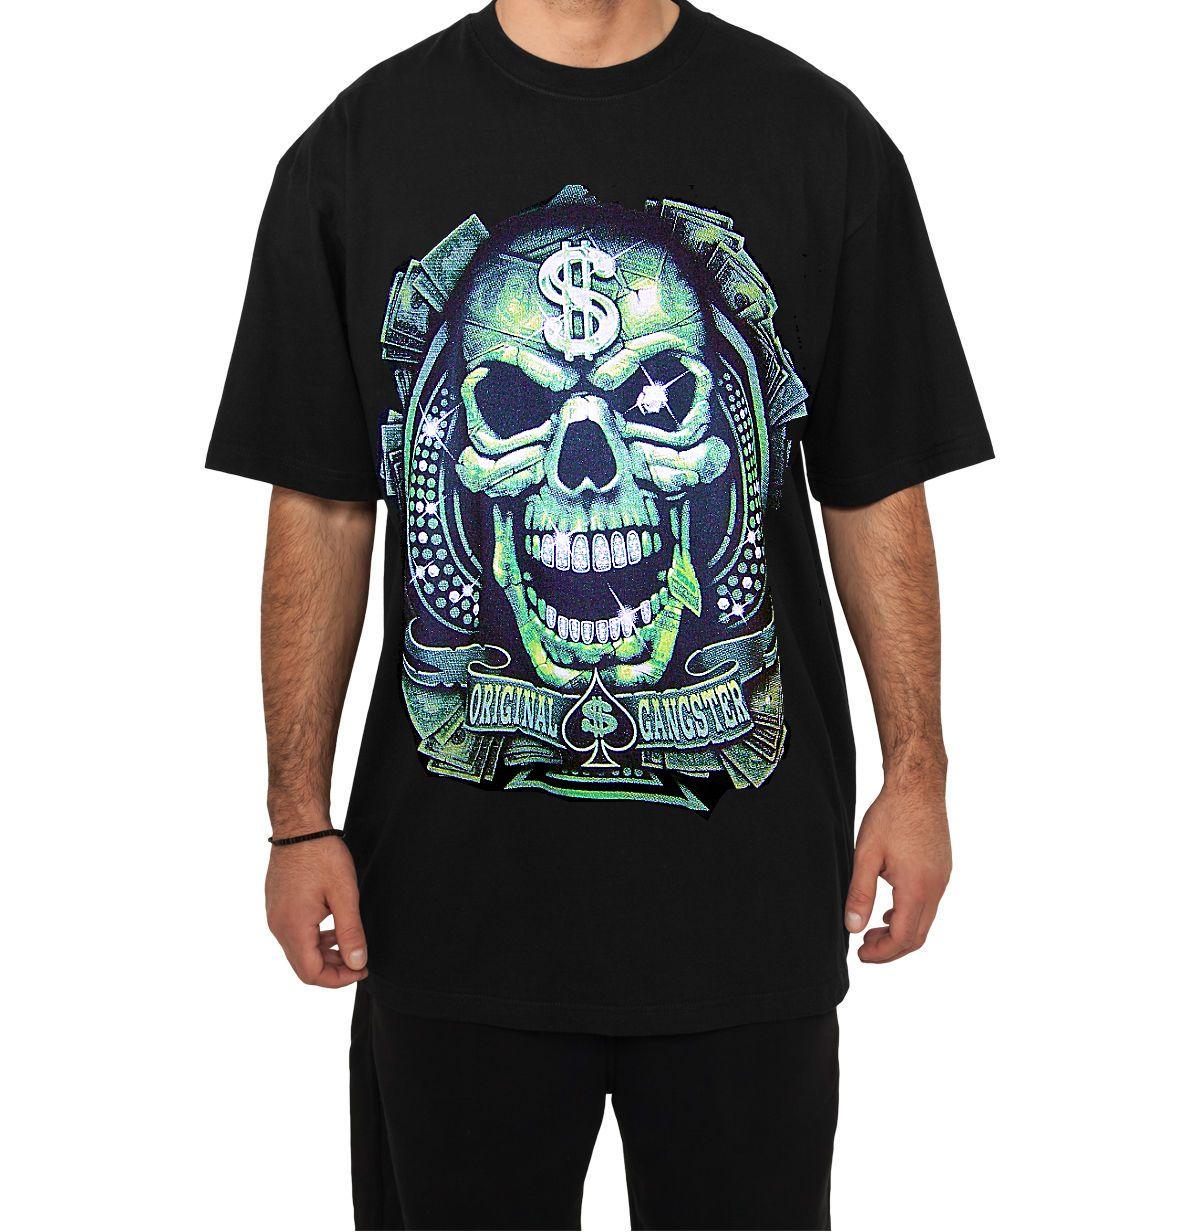 Storenvy coupon: Urban - Original Gangsta with Money and Skull Black T-Shirt